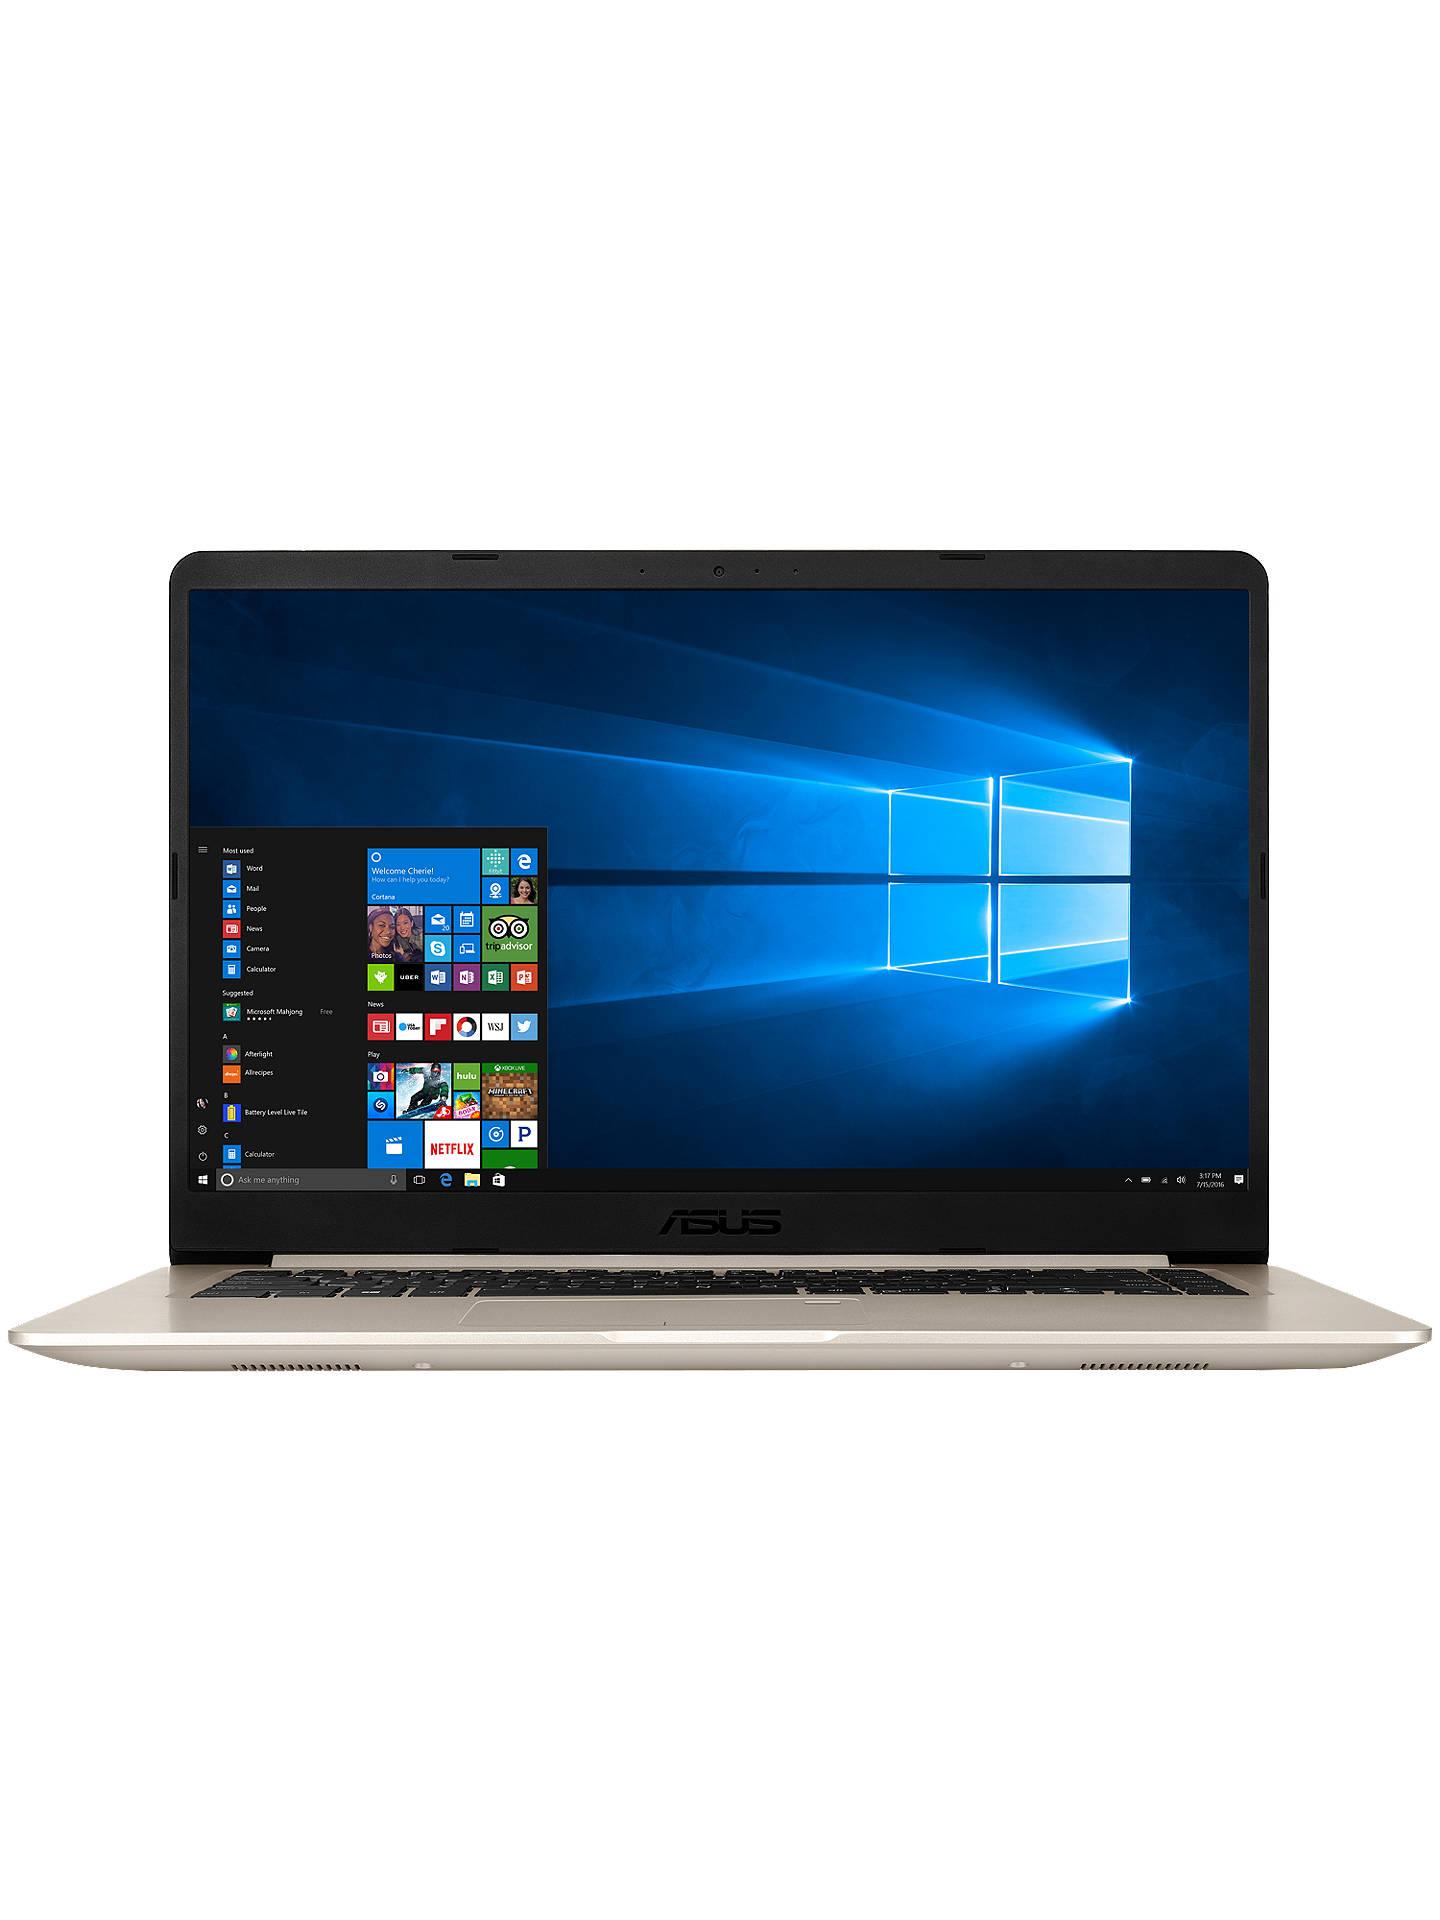 ASUS Vivobook S510 Laptop, Intel Core i7, 8GB RAM, 256GB SSD